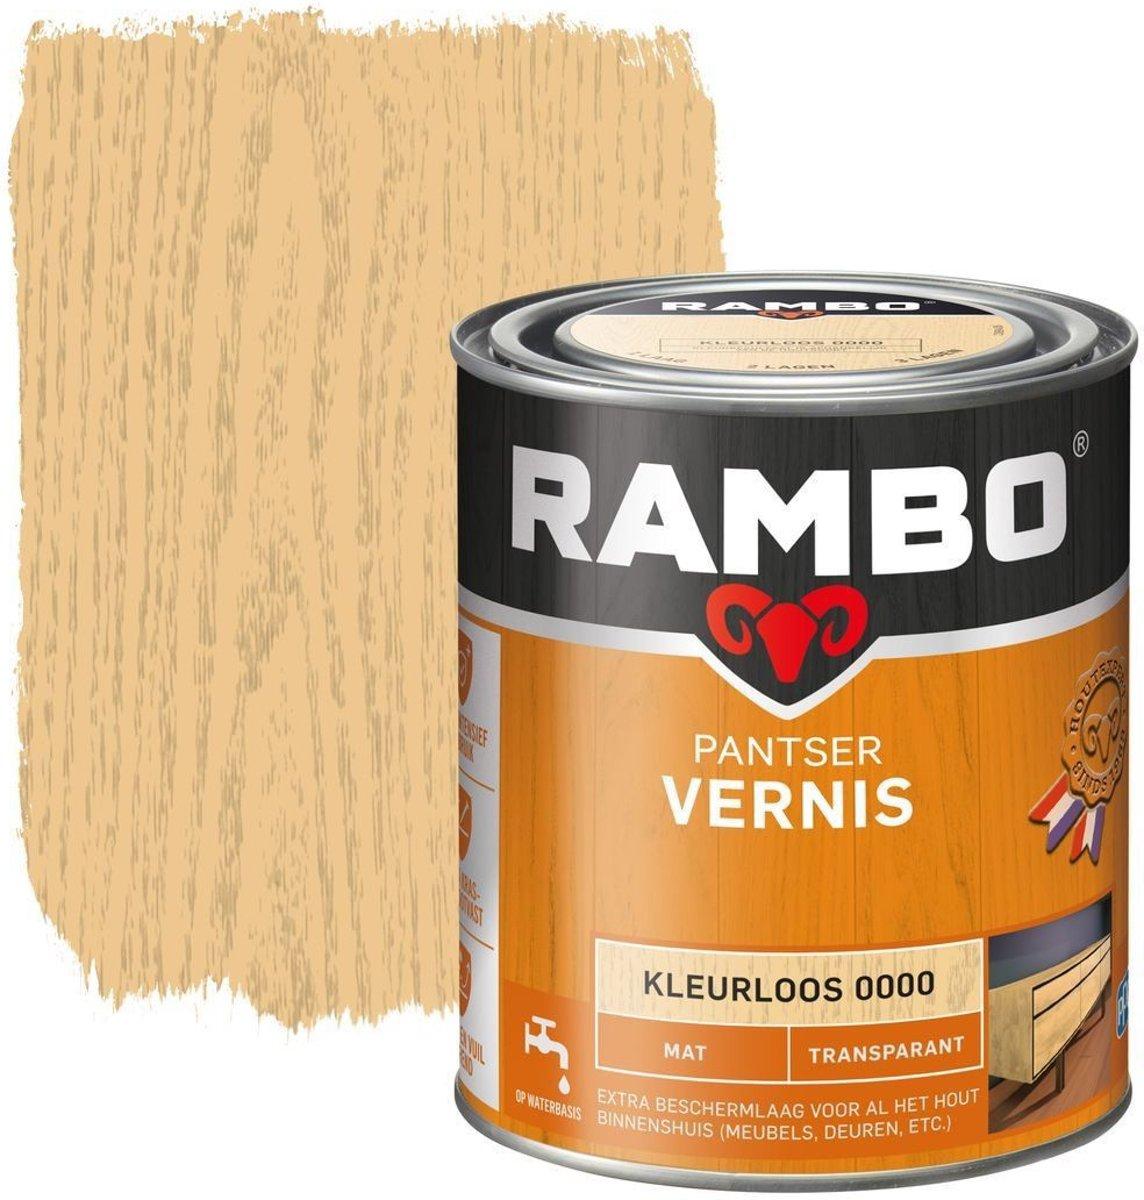 Rambo Pantser Vernis Transparant Mat Kleurloos 0000-0,75 Ltr